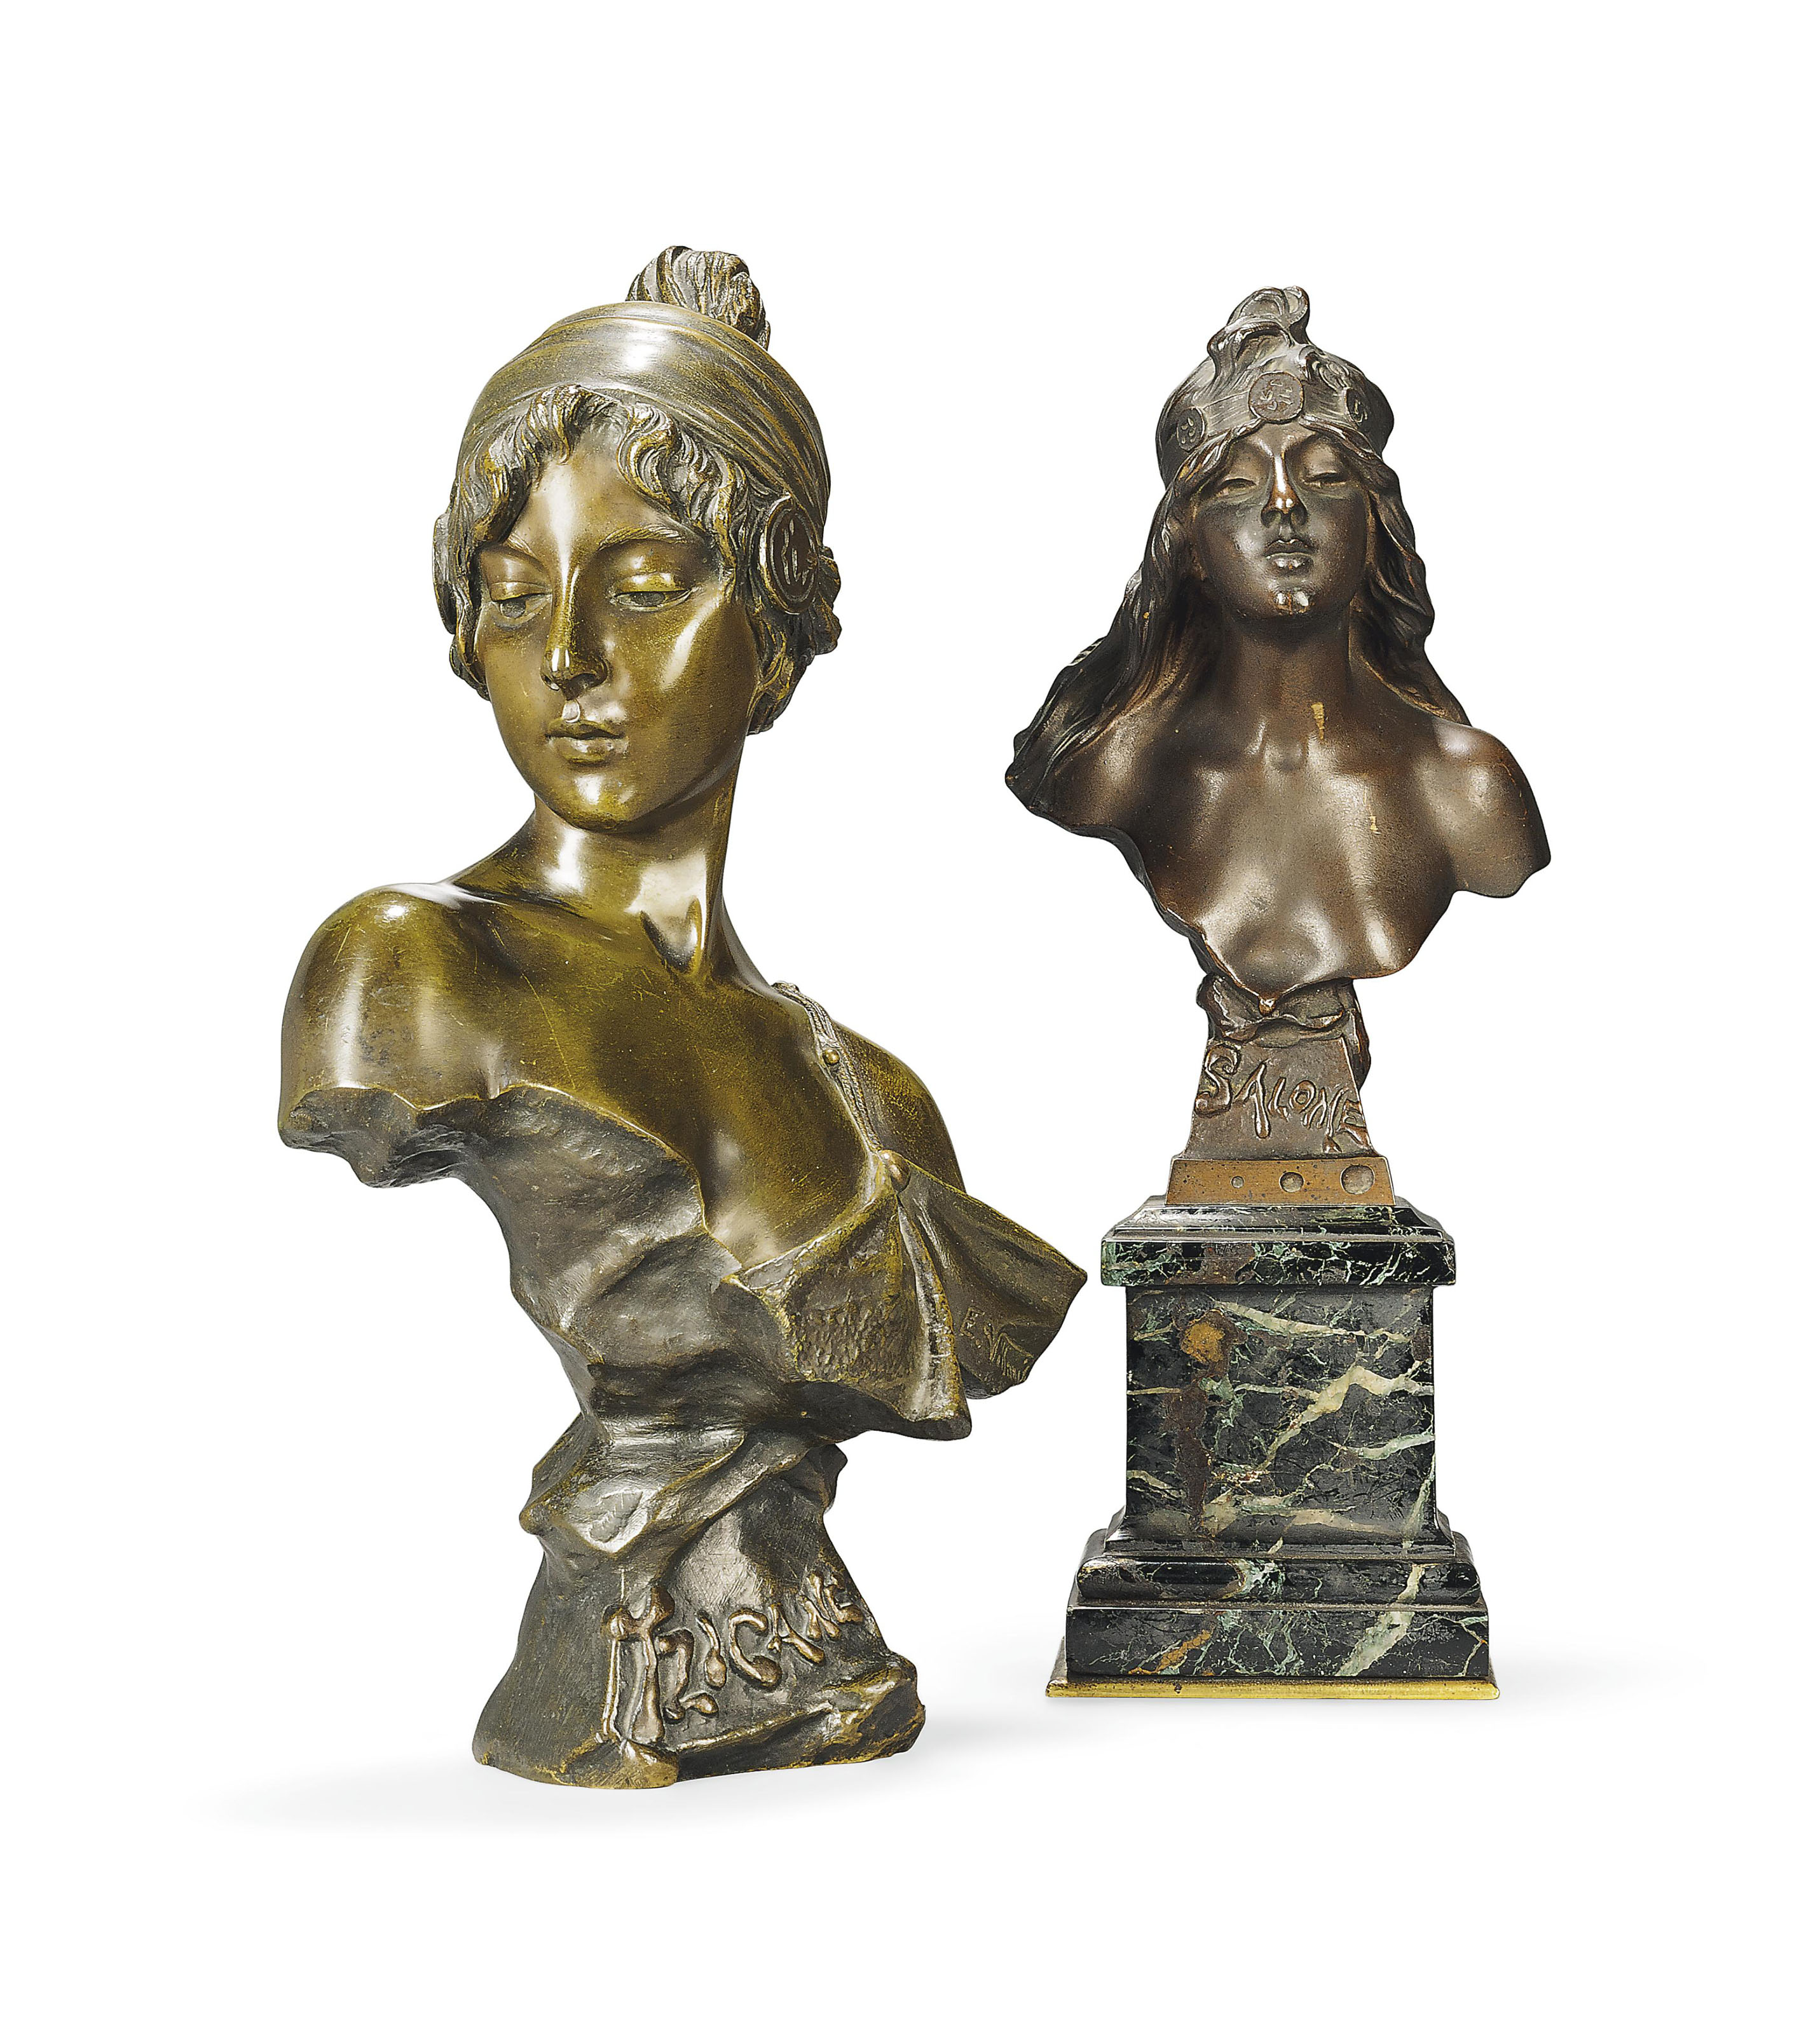 'TZIGANE' AN EMMANUEL VILLANIS (1858-1914) PATINATED BRONZE BUST